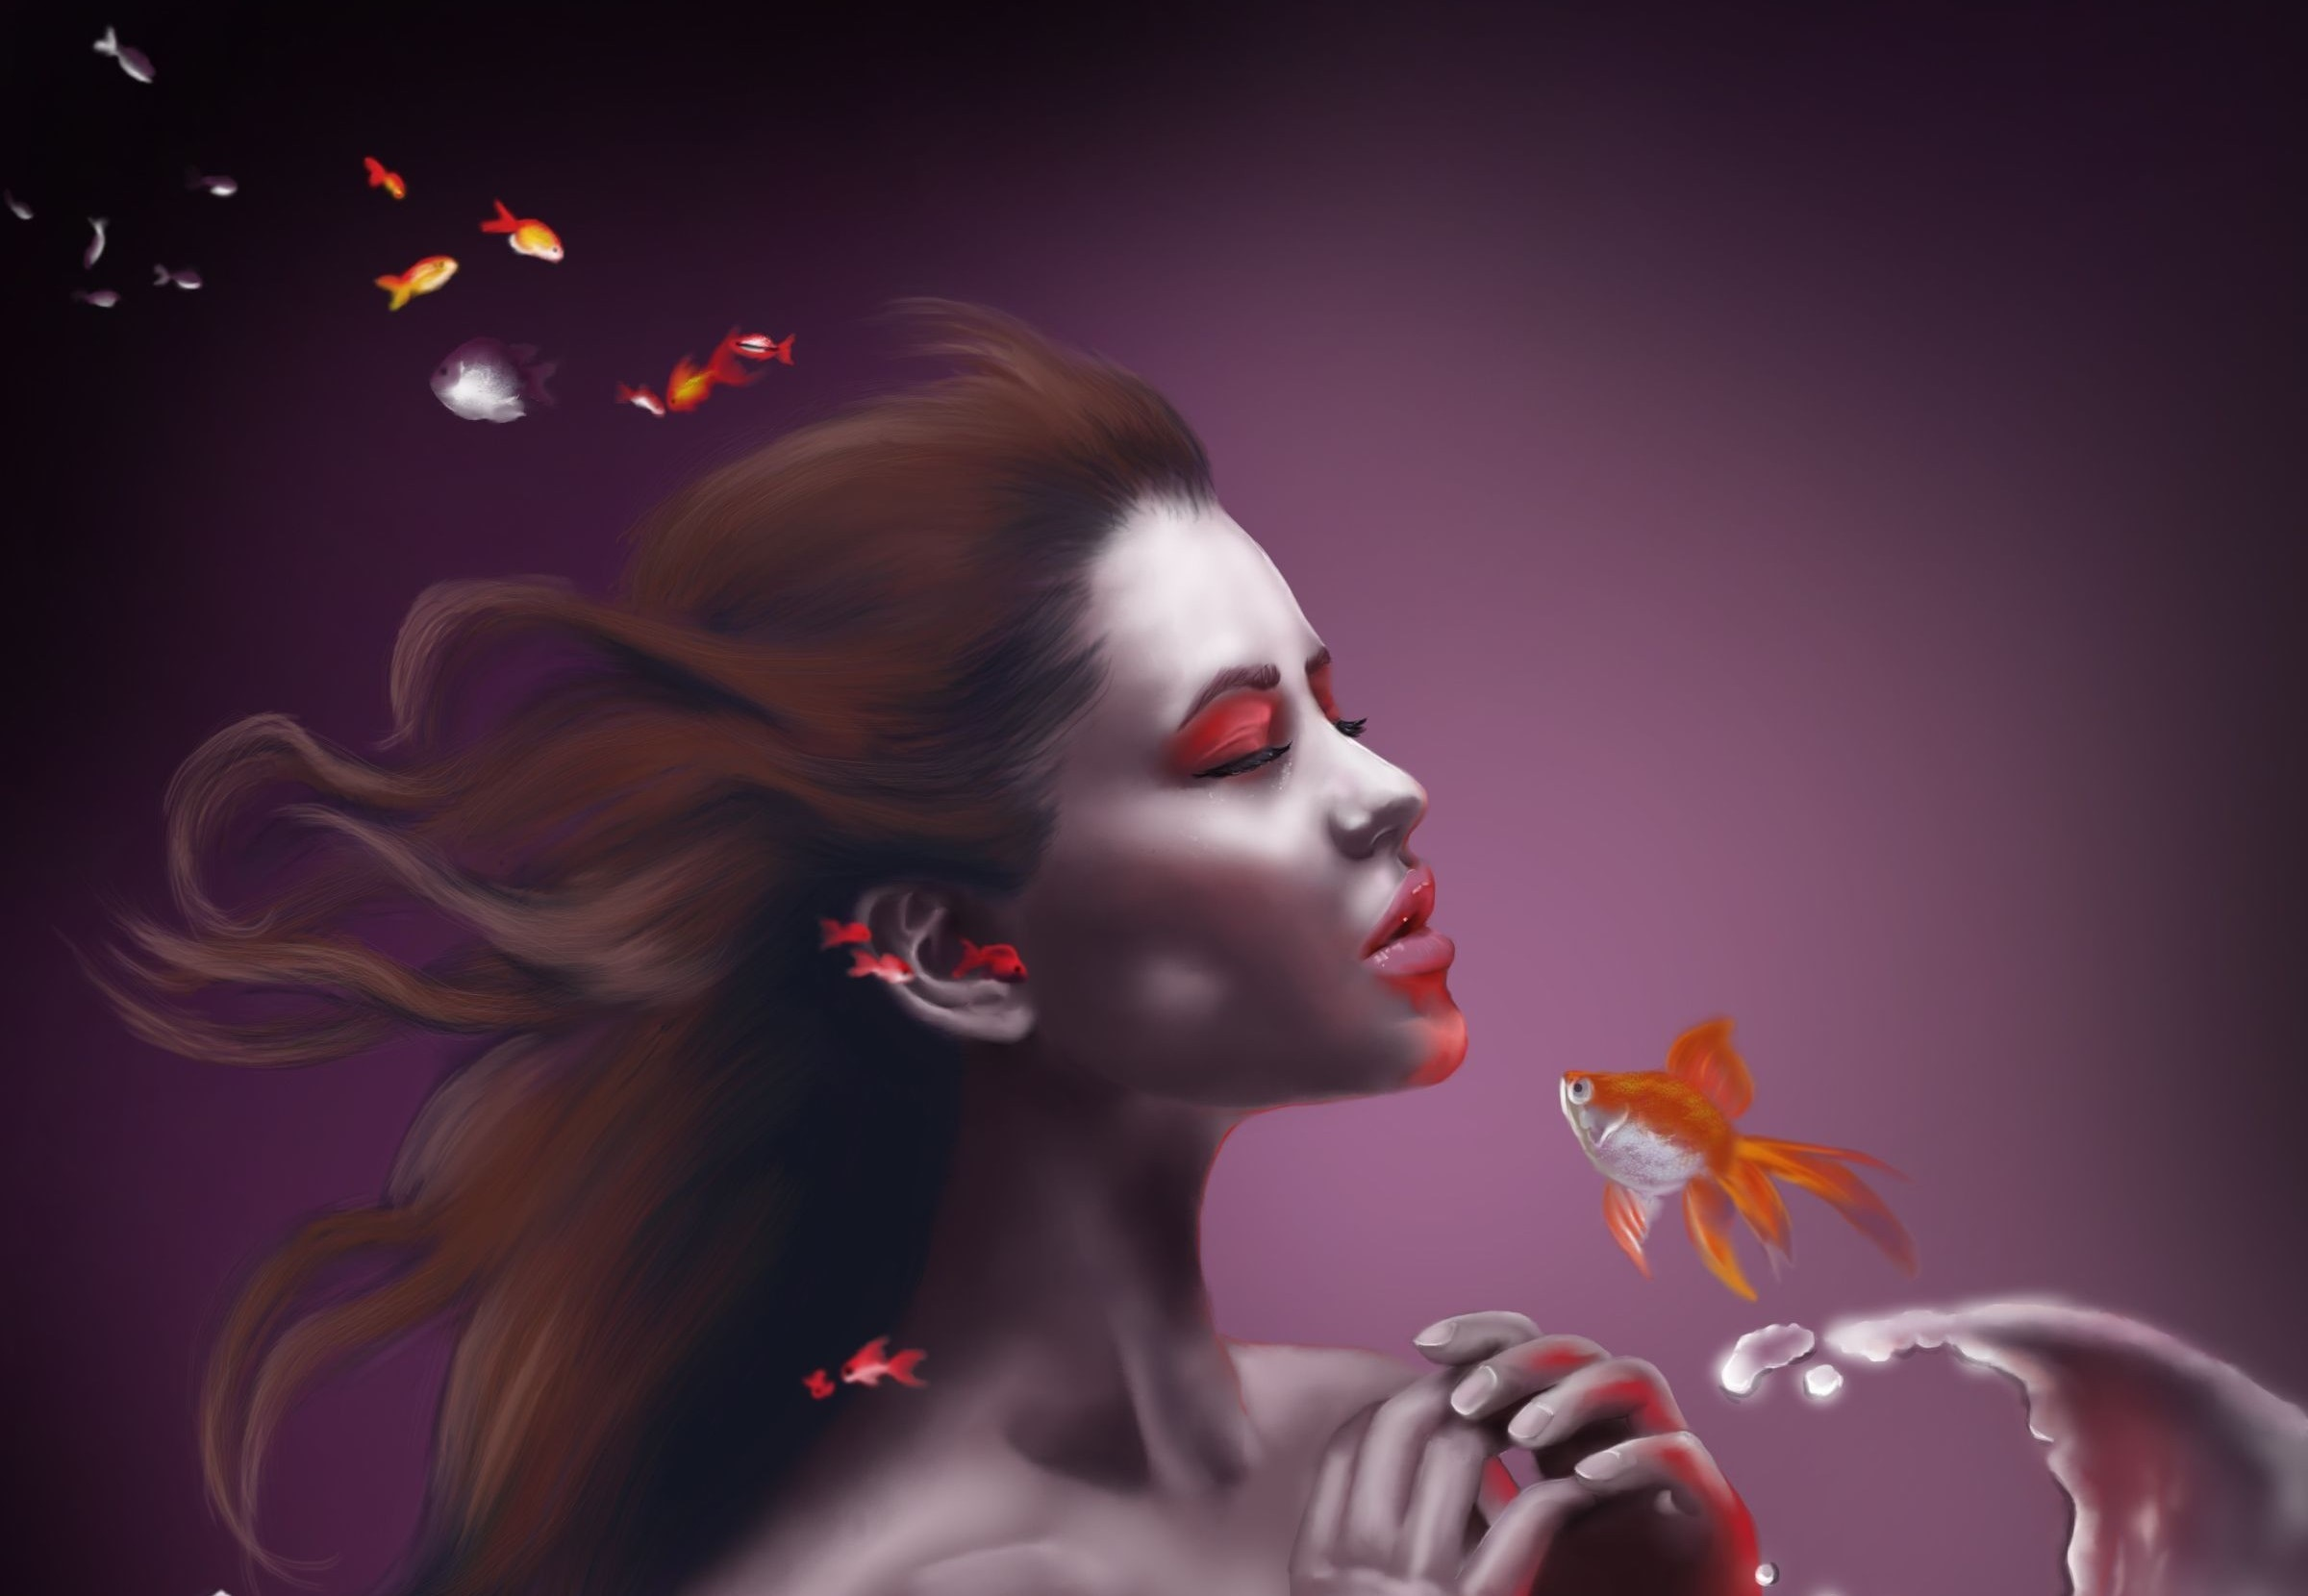 Fantasy - Mermaid  Wallpaper